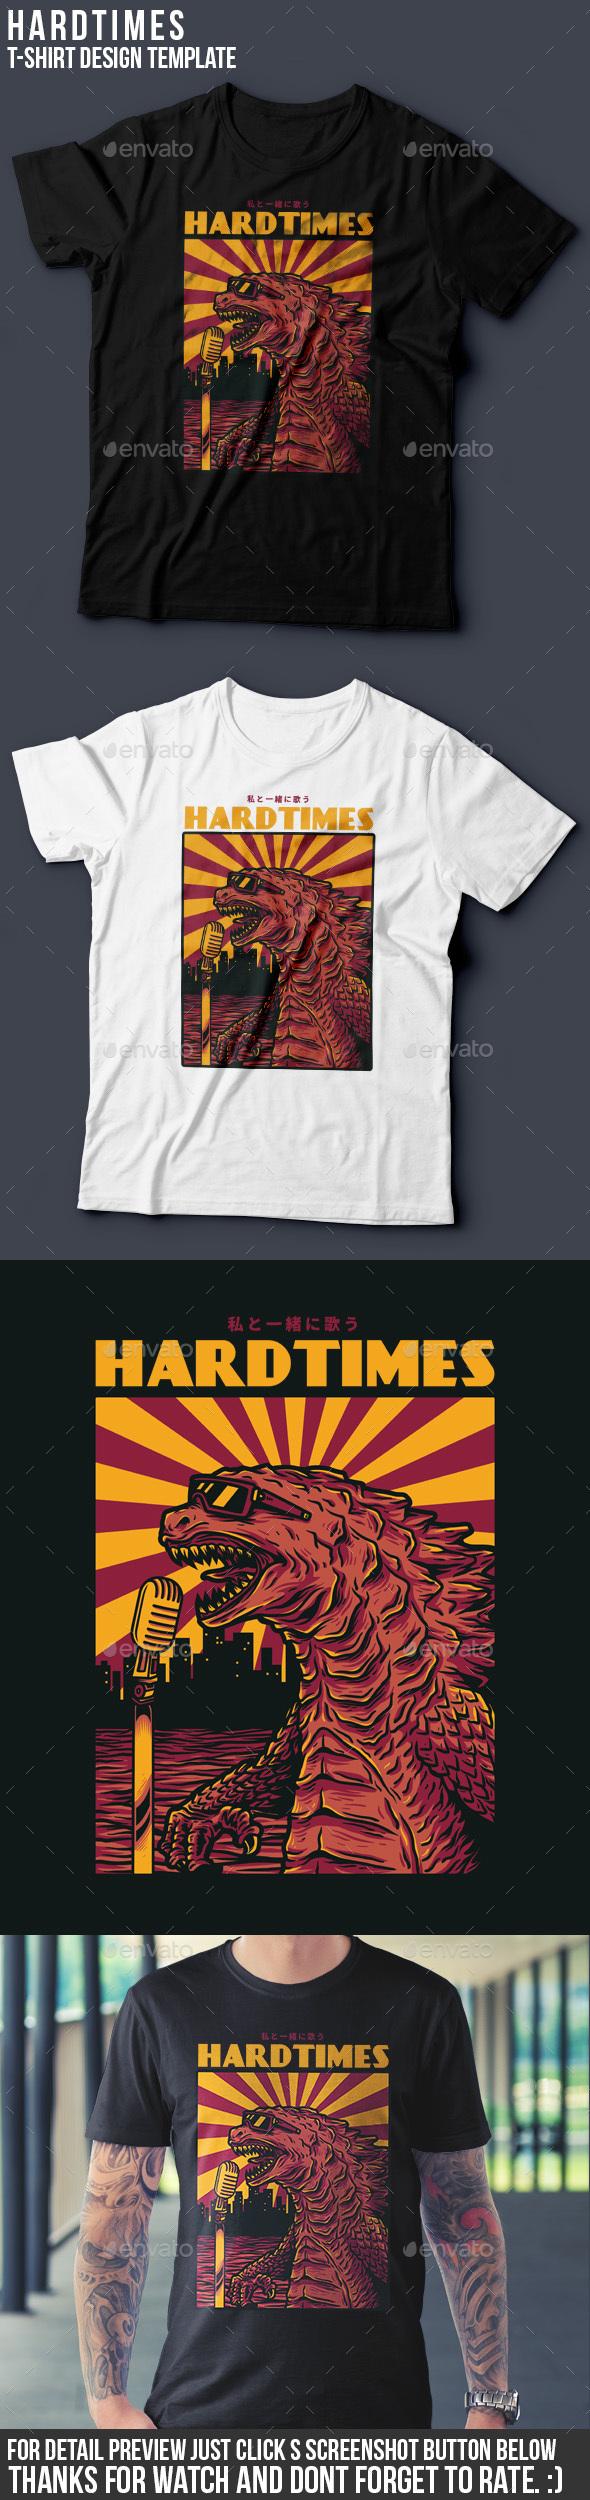 Hardtimes T-Shirt Design - Funny Designs